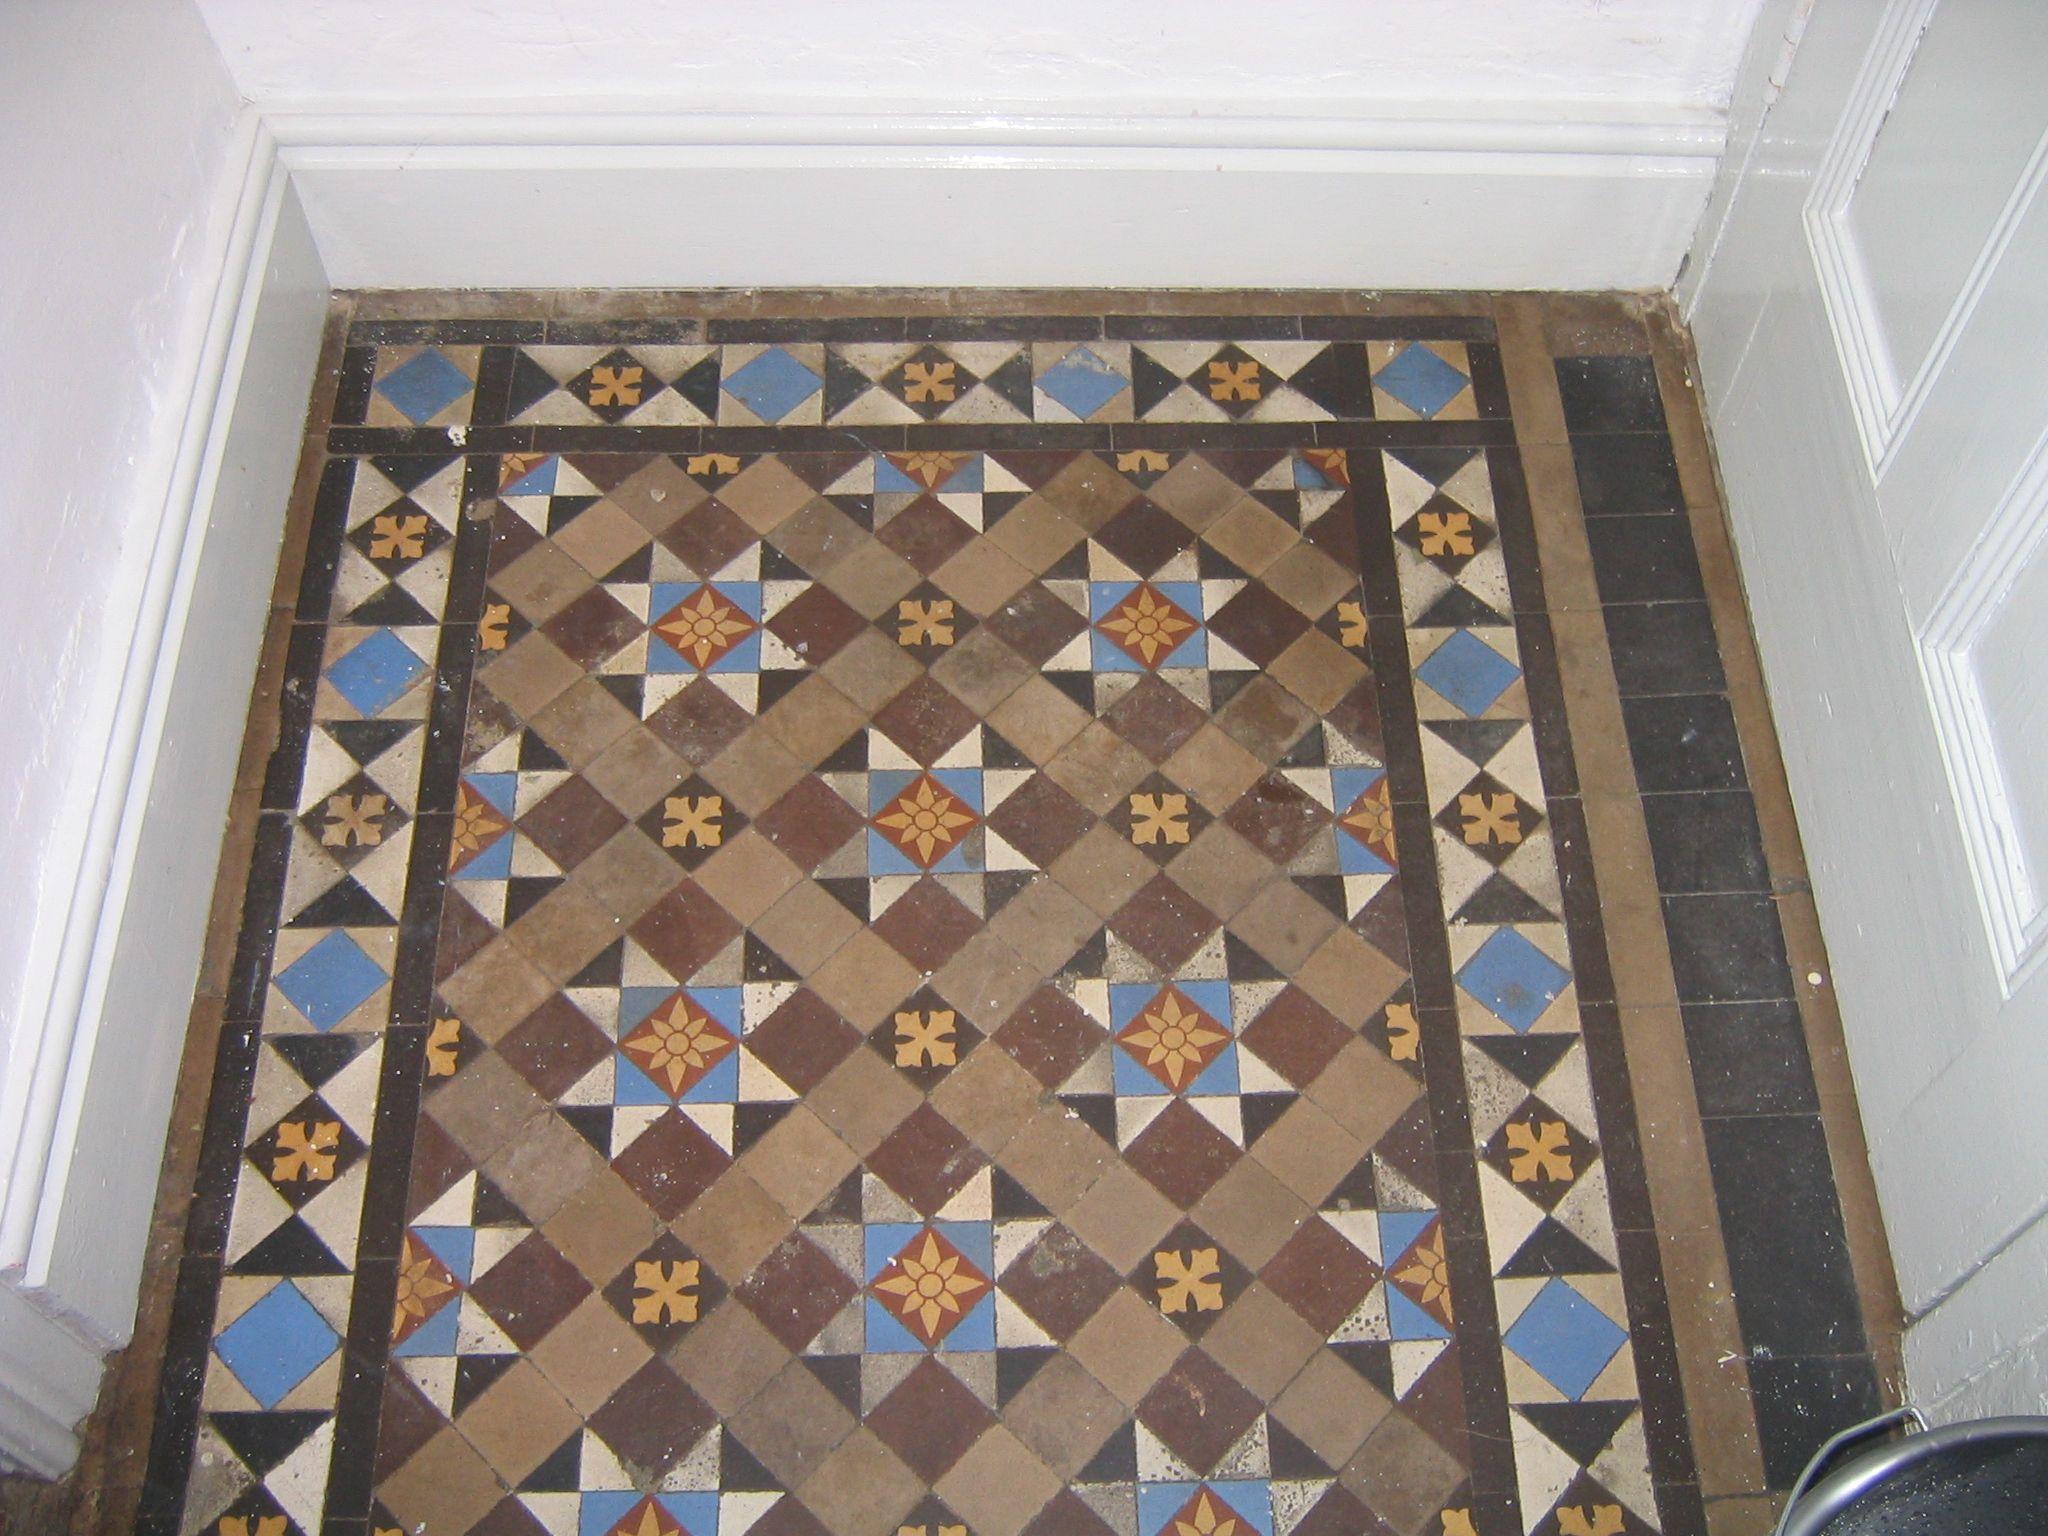 Minton Floor Tiles I Have These Tiles Victorian Tiles Minton